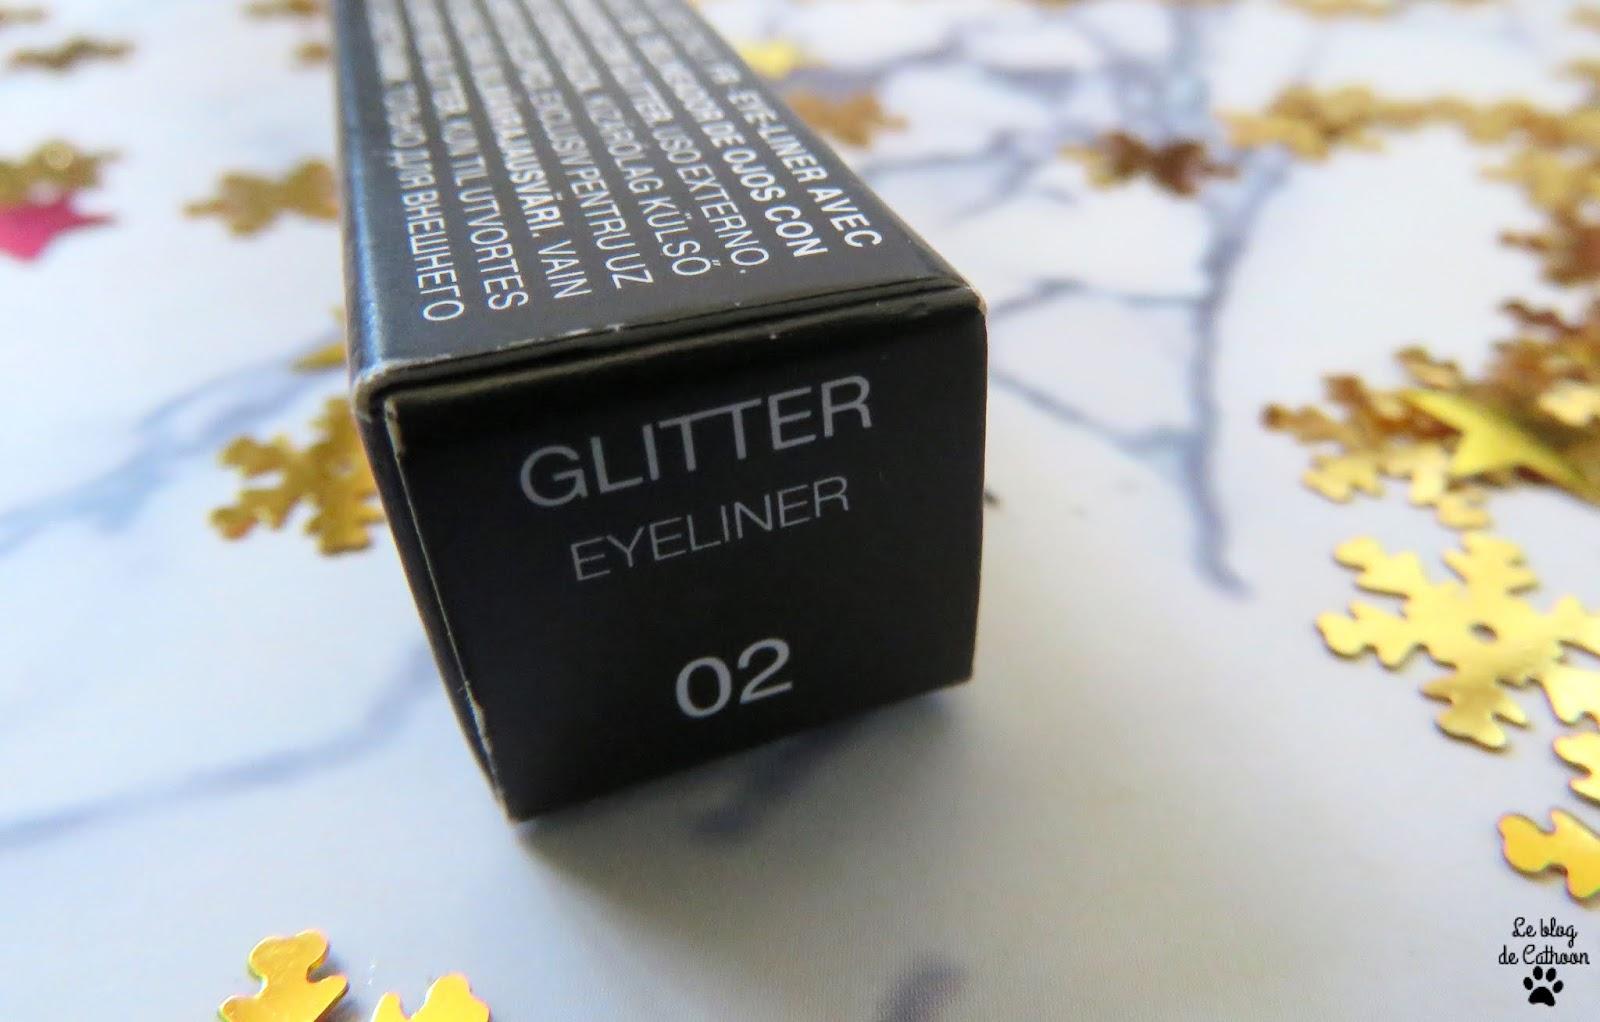 Glitter Eyeliner - 02 Silver - Kiko